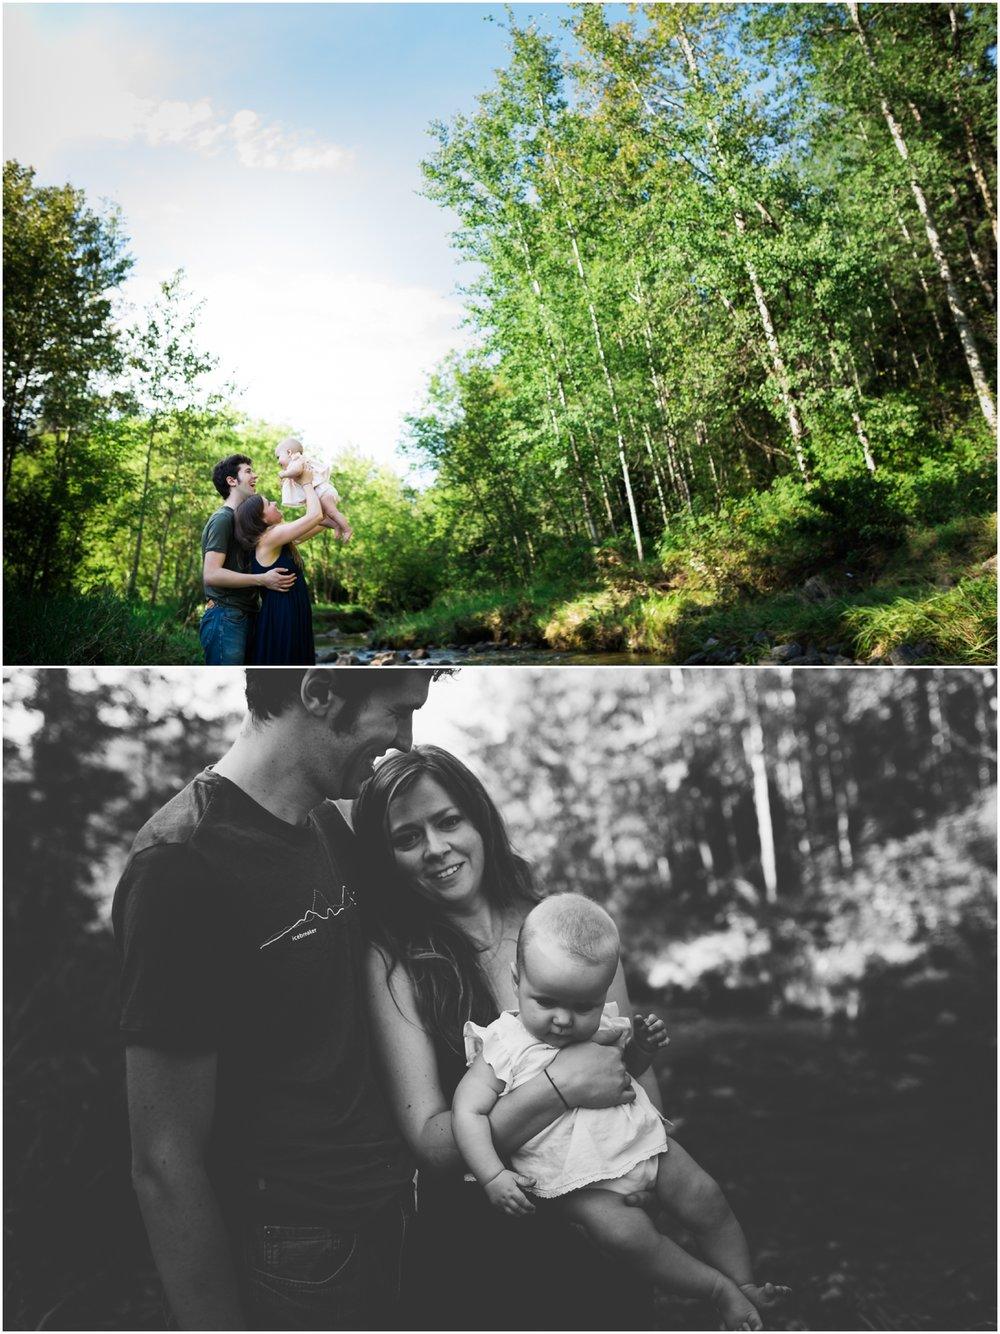 Edmonton family photographer best of 2016 august